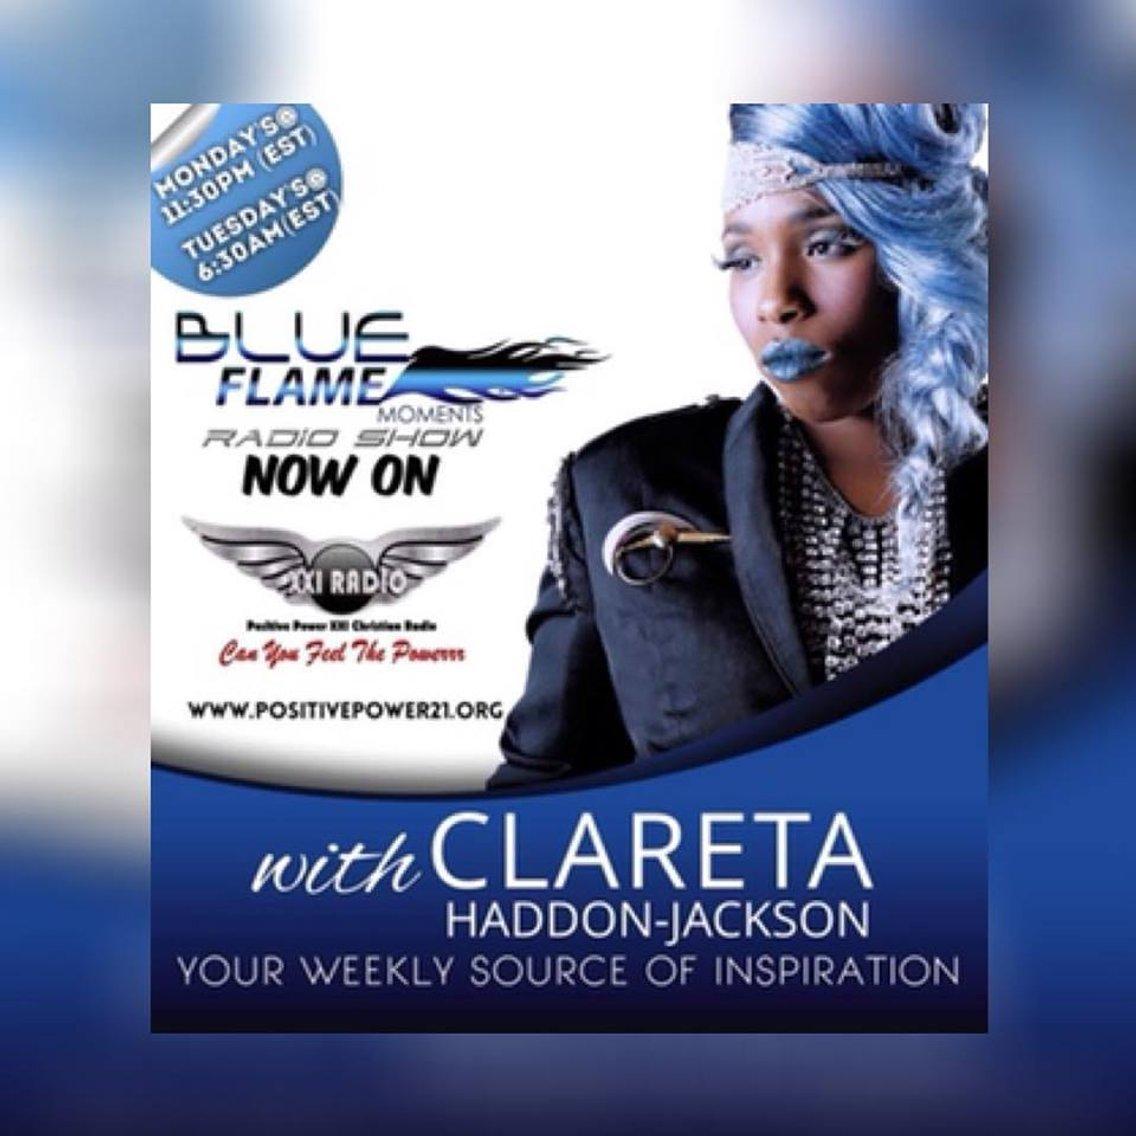 Blue Flame Moments with Clareta - immagine di copertina